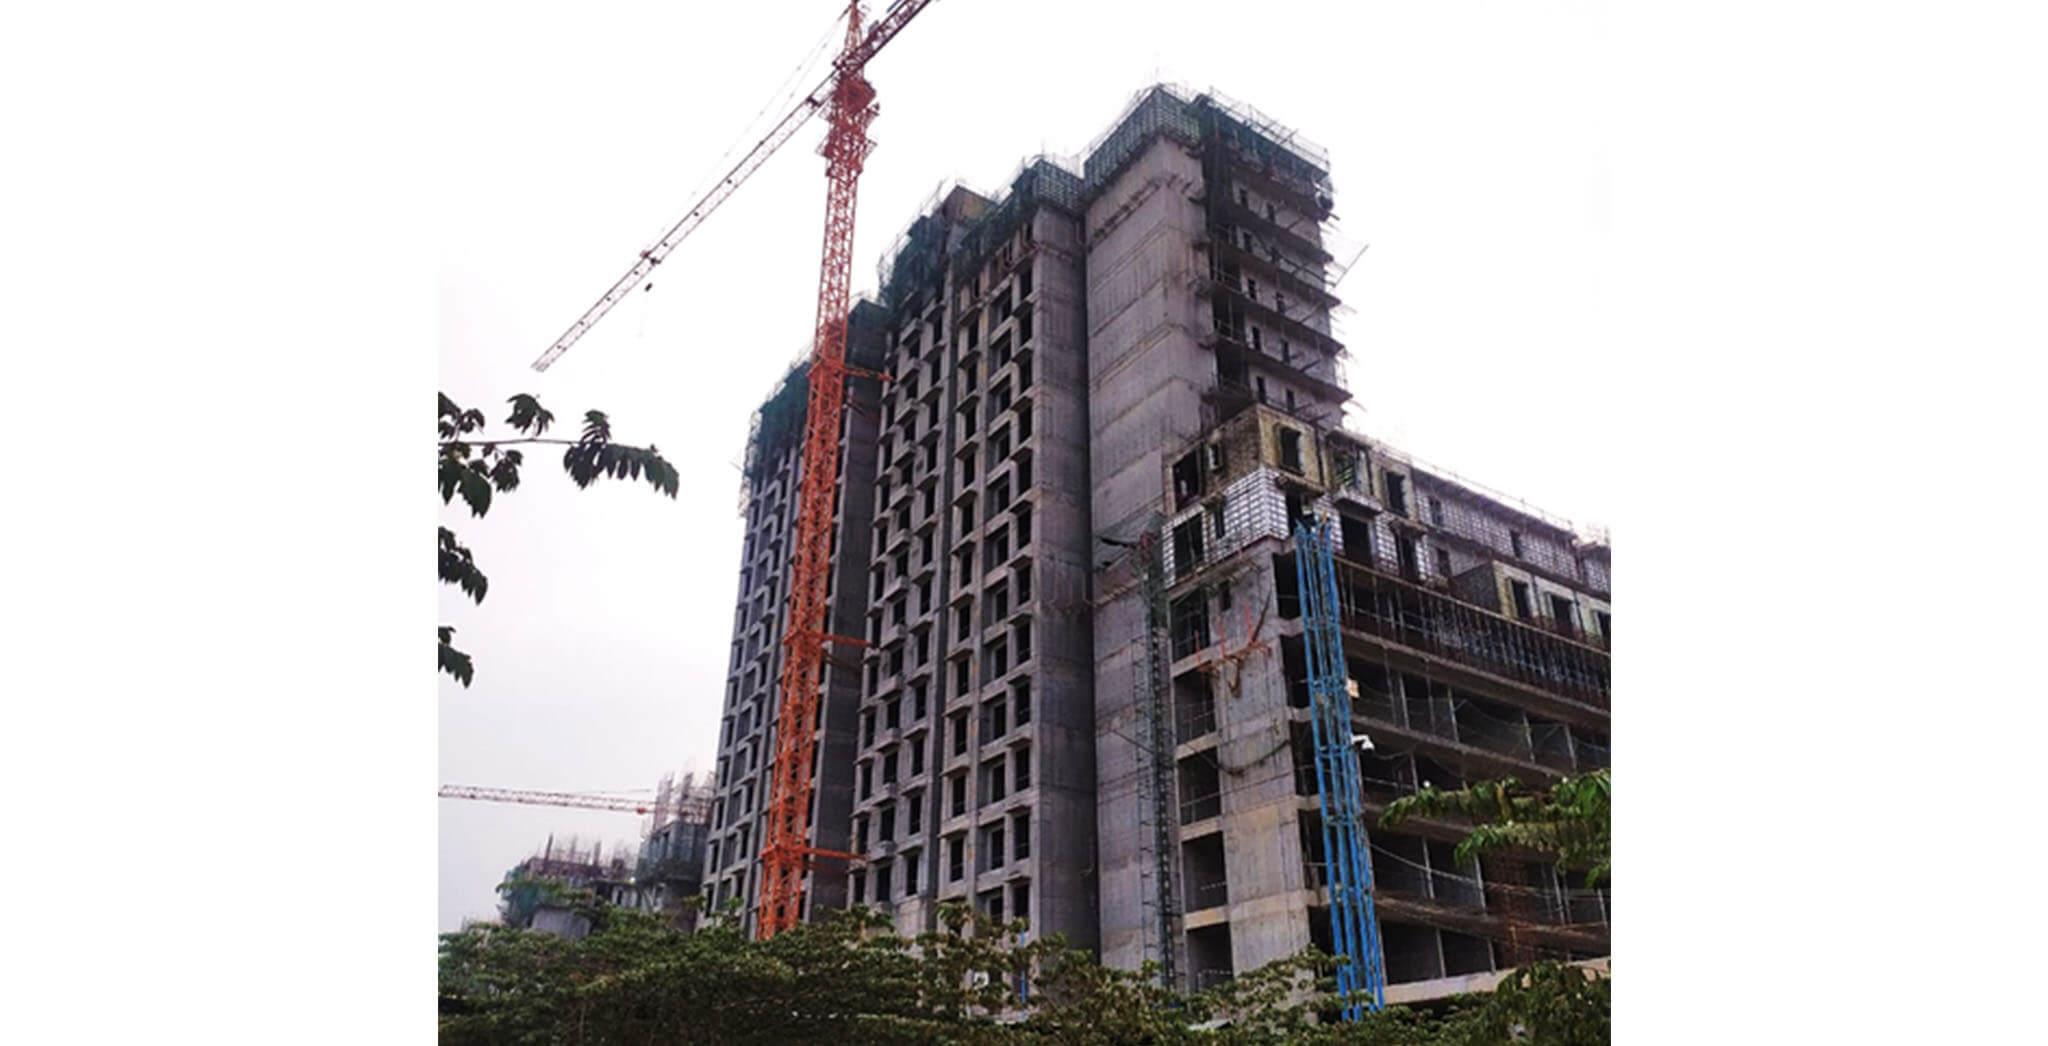 Apr 2021 - Gallium Block: South side elevation—Ground floor to 18th floor